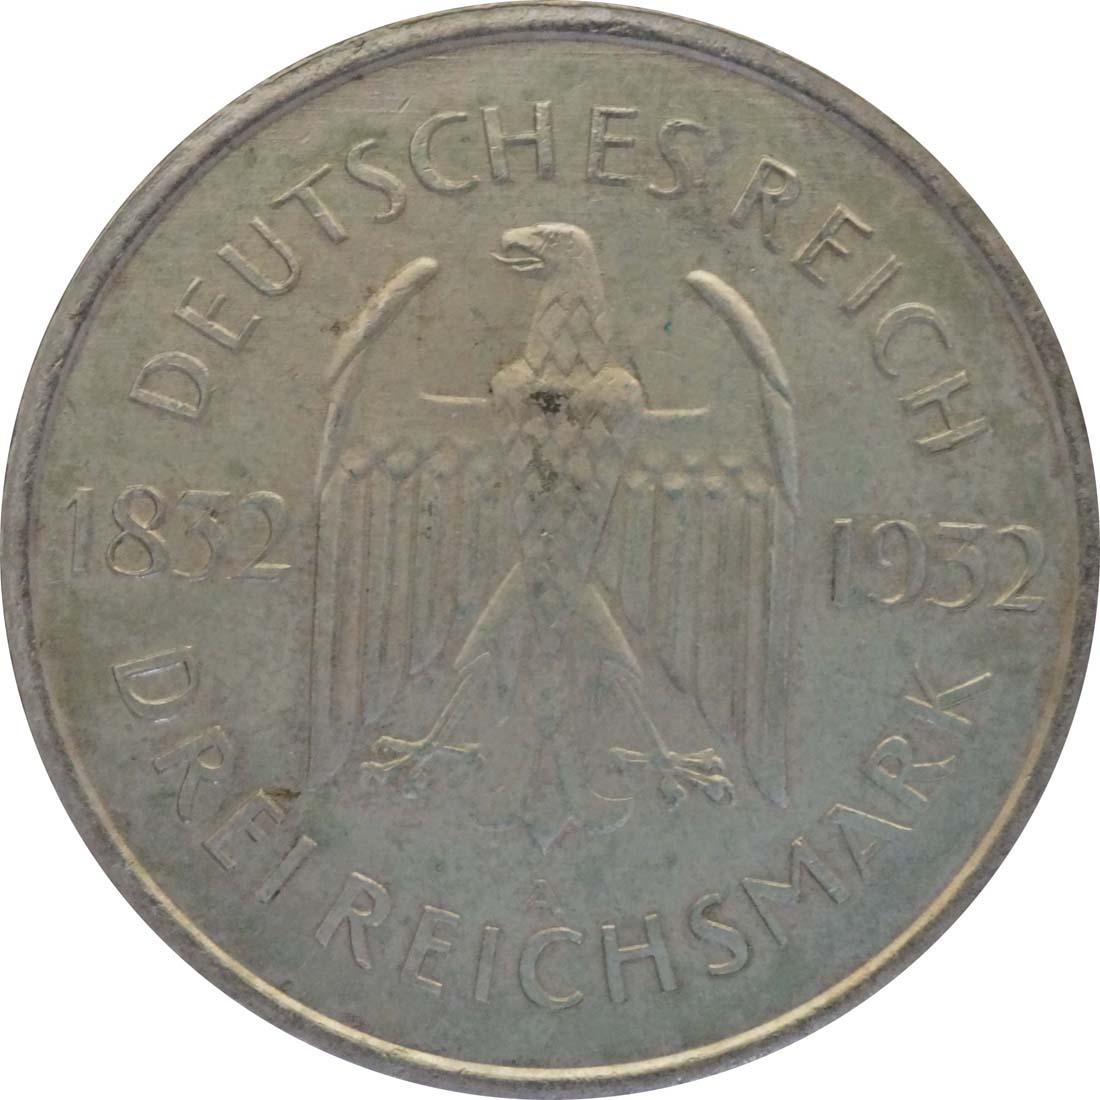 deutschland 3 reichsmark goethe 1932 a silber vz 85 euro. Black Bedroom Furniture Sets. Home Design Ideas